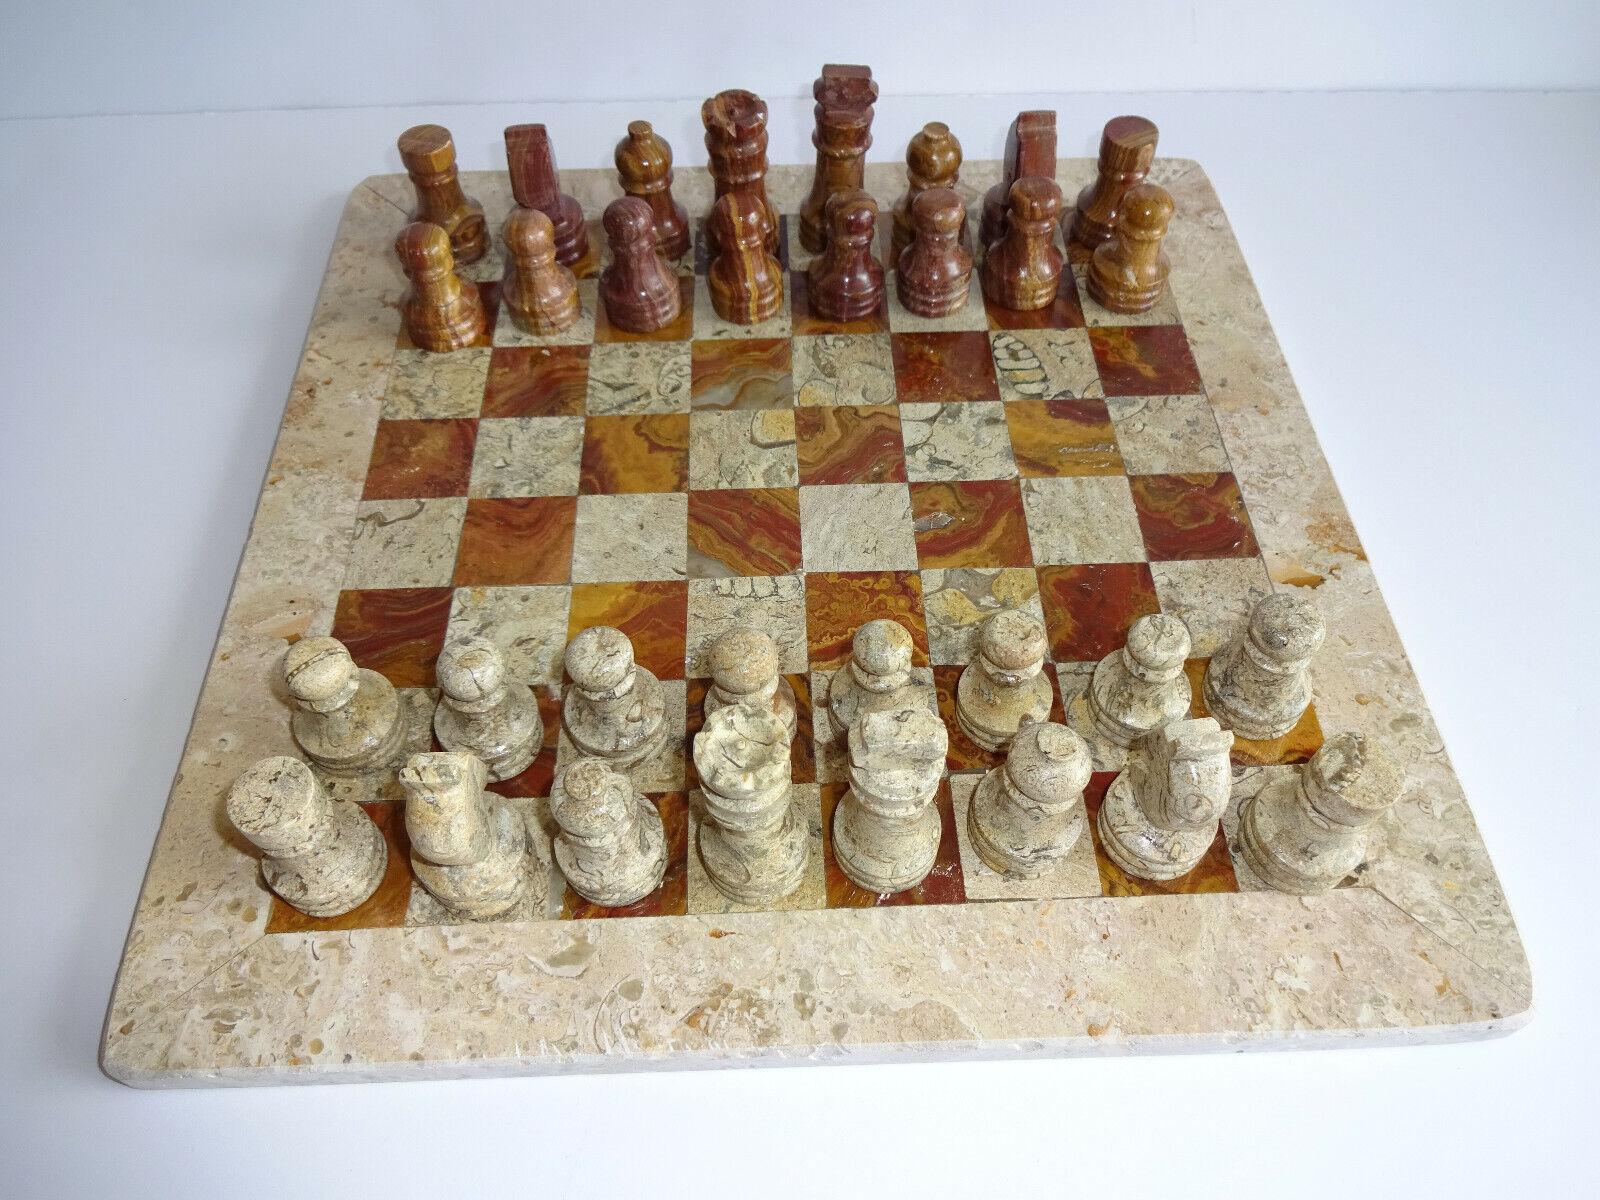 Marble Chess Set braun Tan Stone Pieces Board Game No Case 12-1 4  New NOS  1